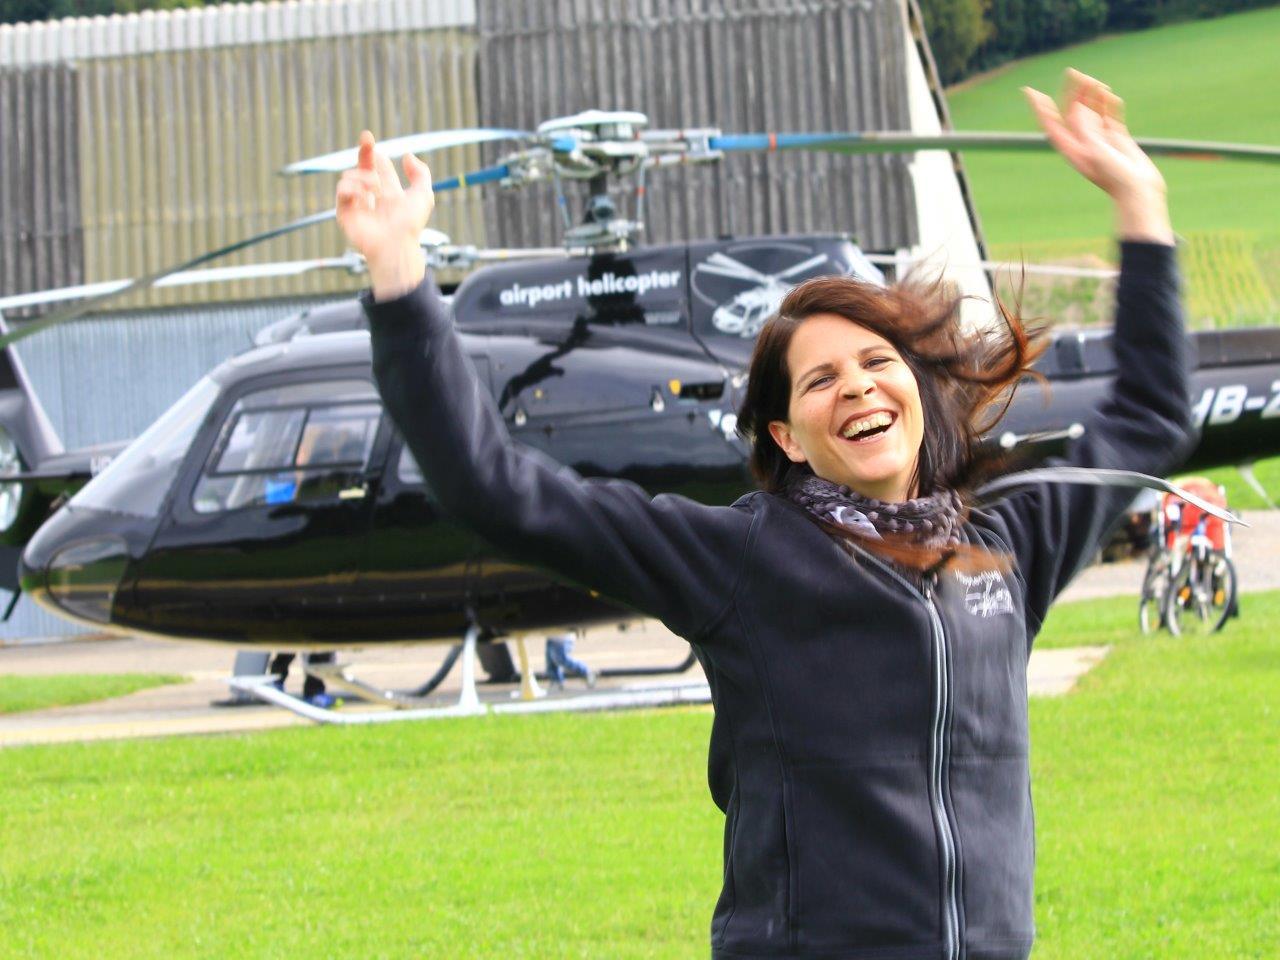 Helikopter Rundflug Luzern Beromünster